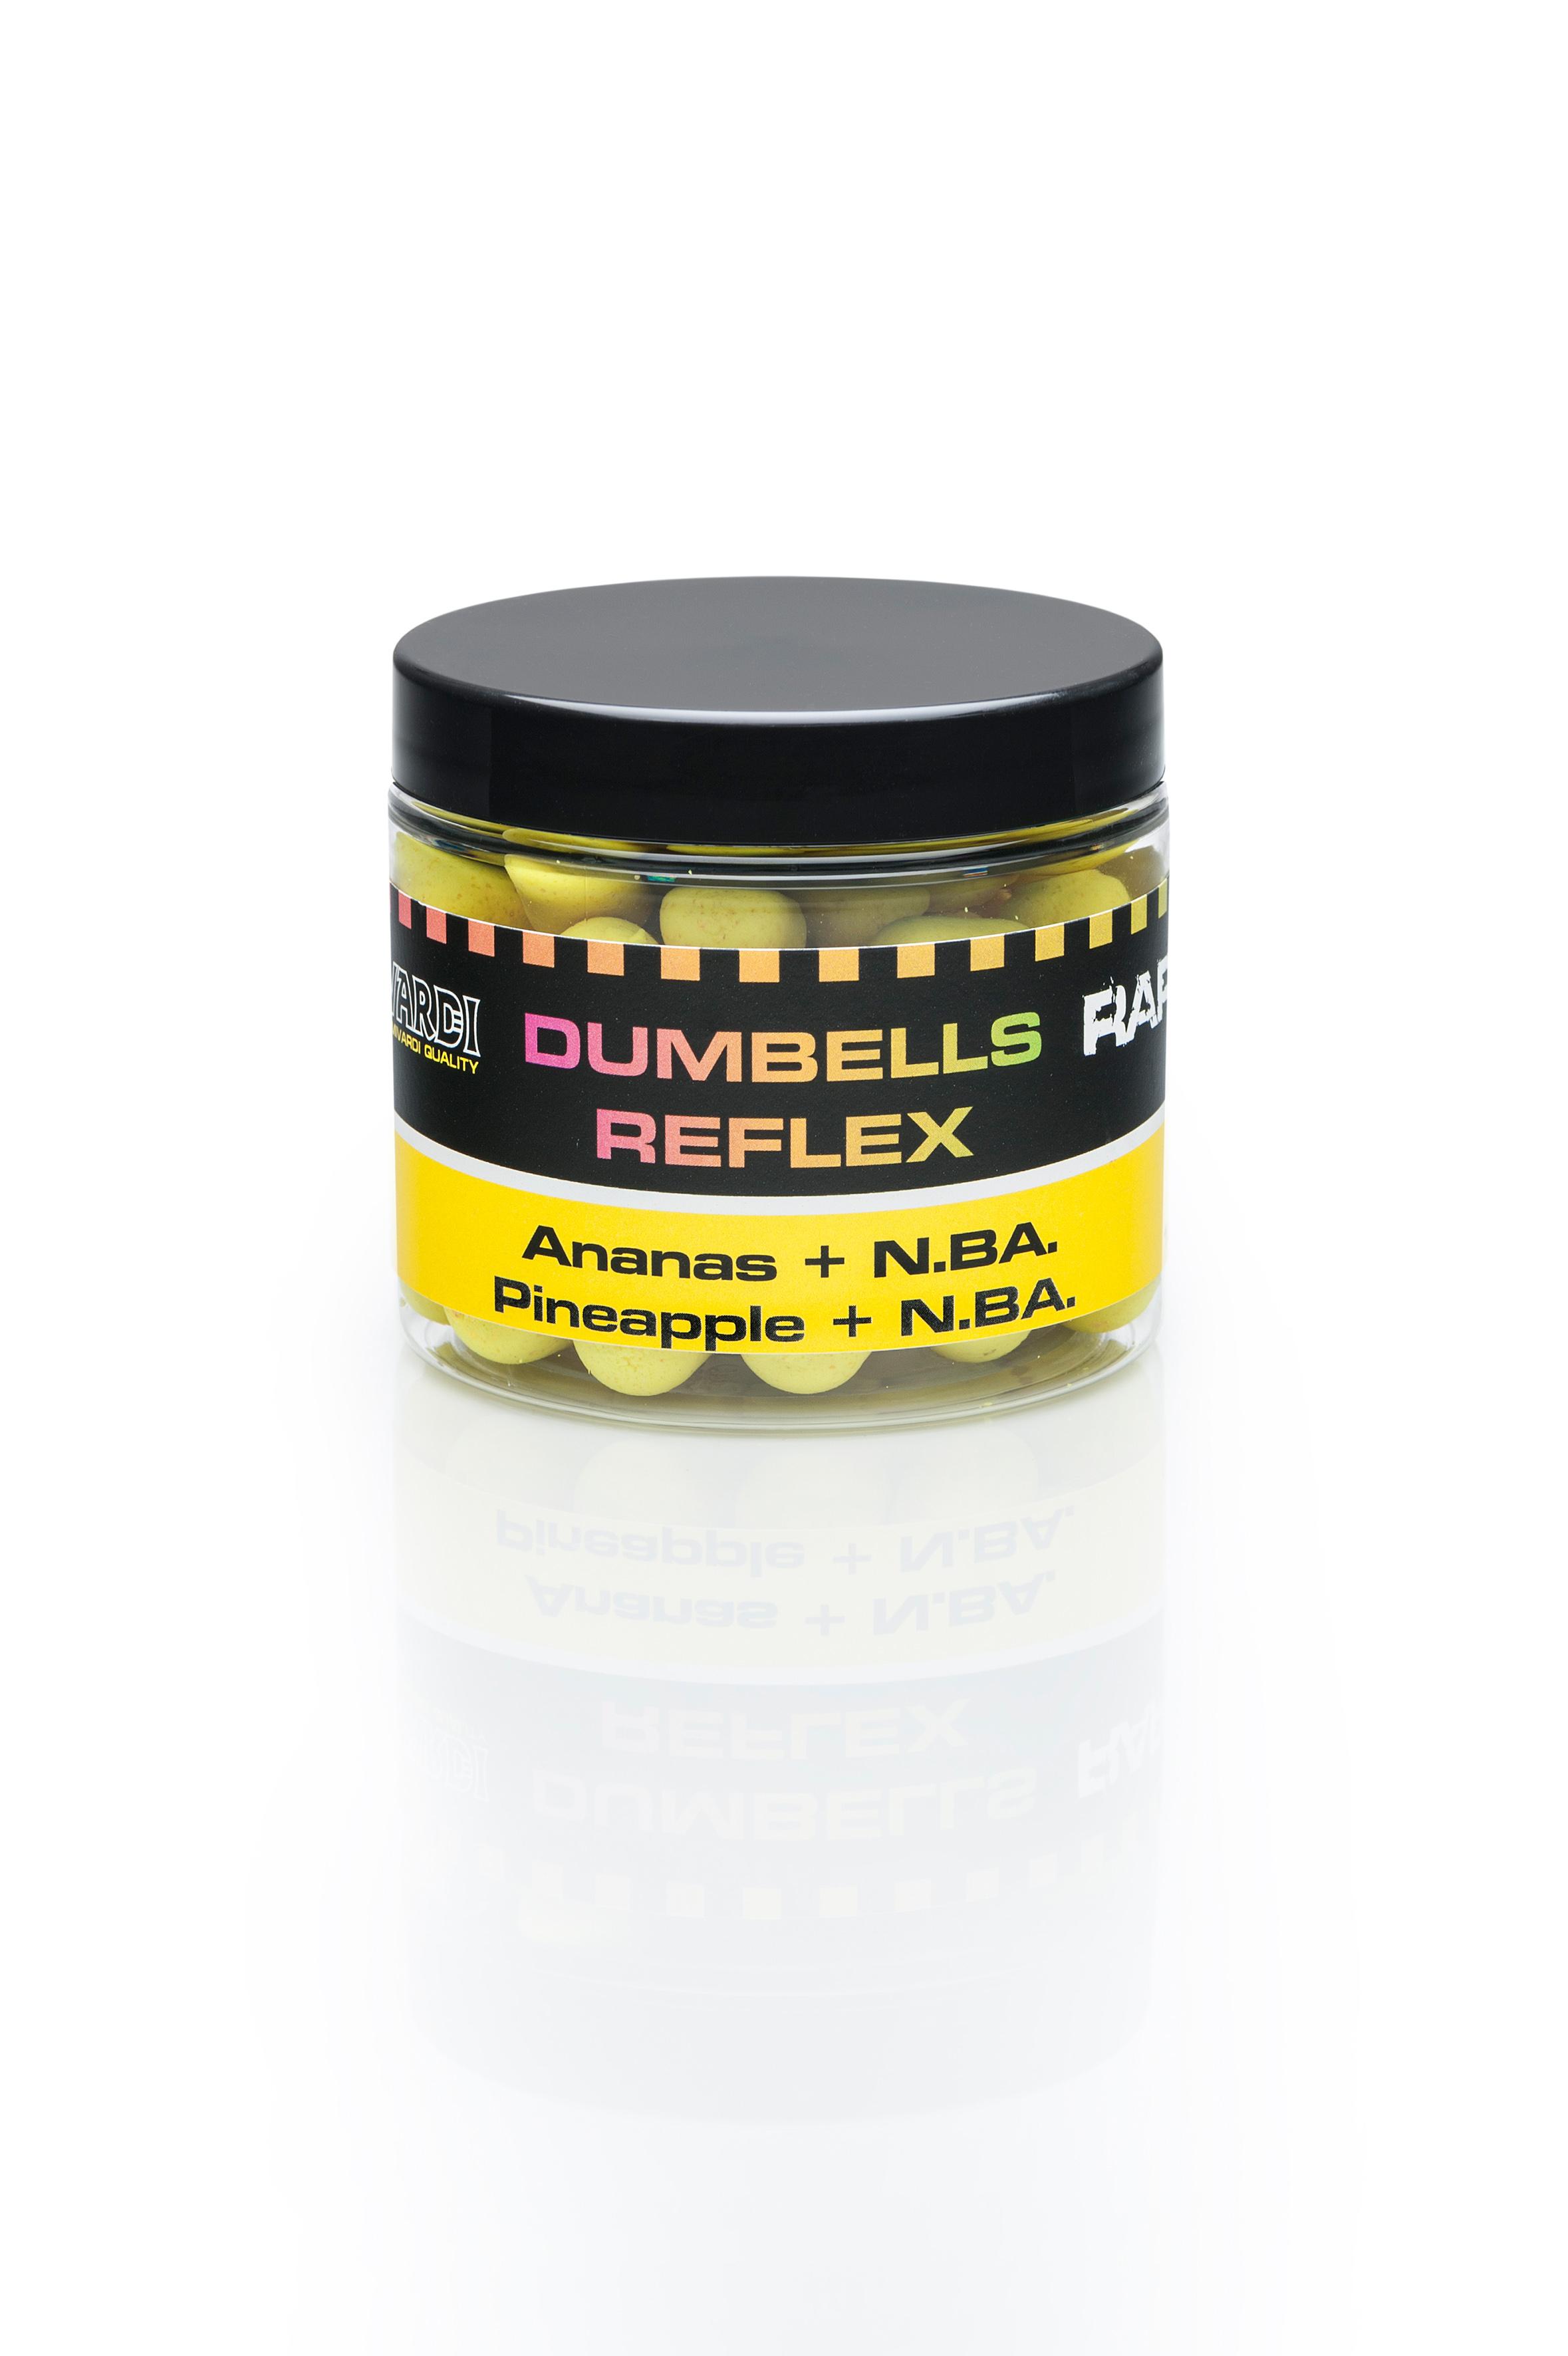 Plovoucí boilies Mivardi Rapid Dumbells Reflex Ananas + N.BA. 18 mm